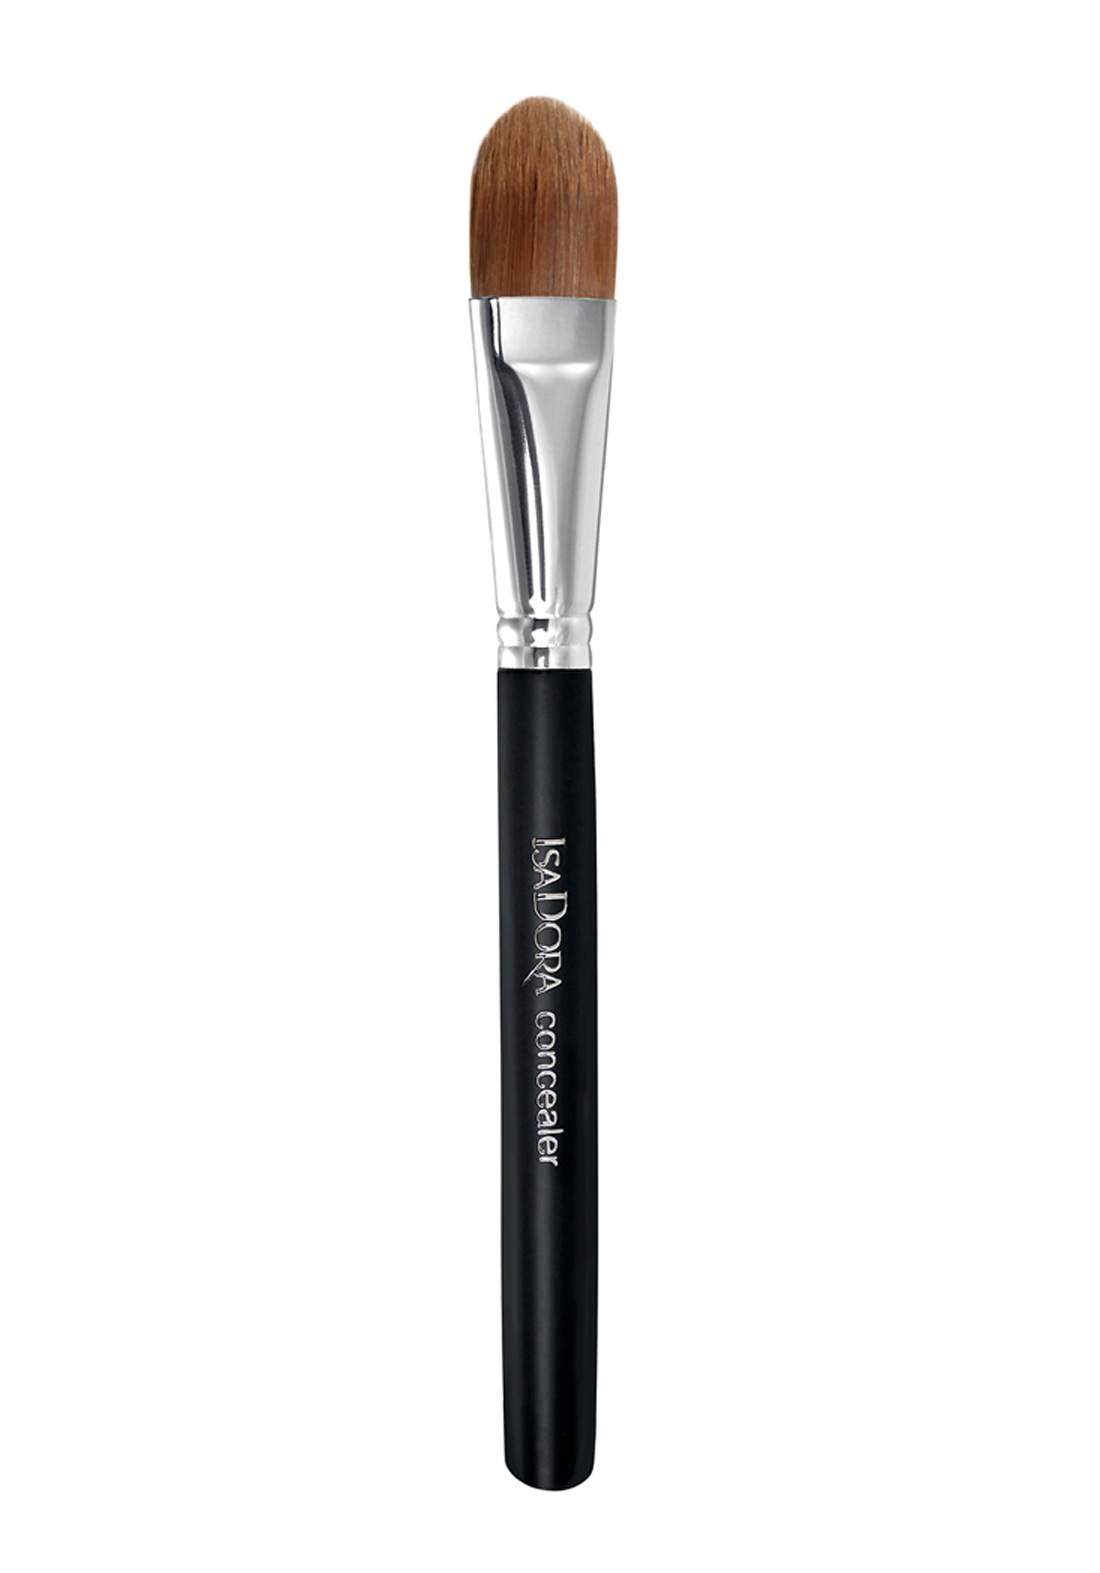 314181 Isadora Accessories - Concealer Brush فرشاة كونسيلر